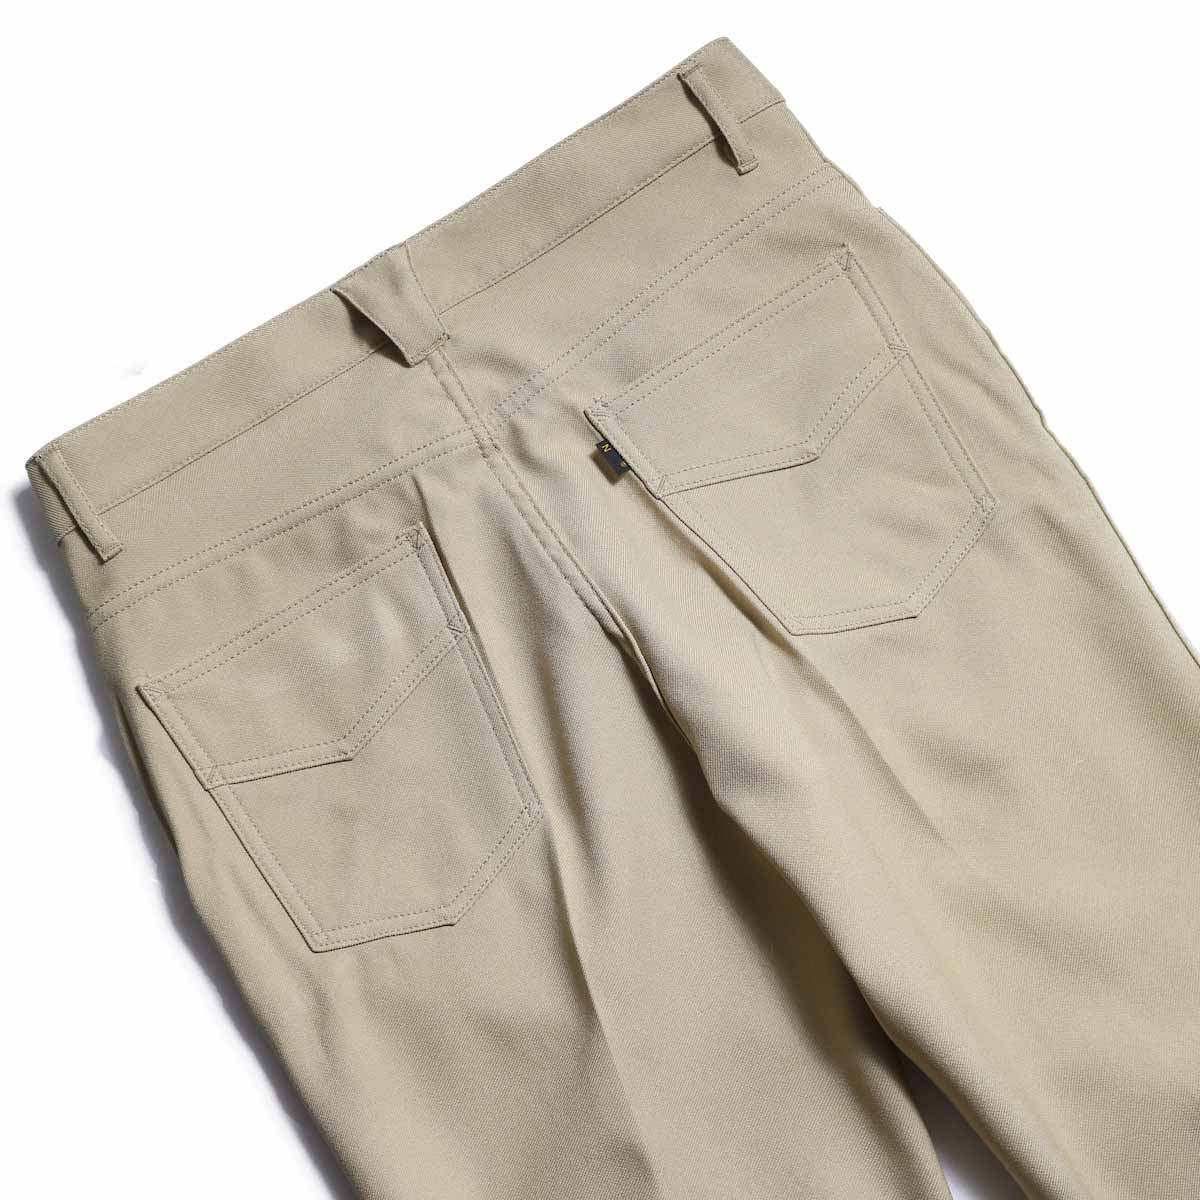 NEEDLES / Boot Cut Jean -Poly Twill (Beige) 背面